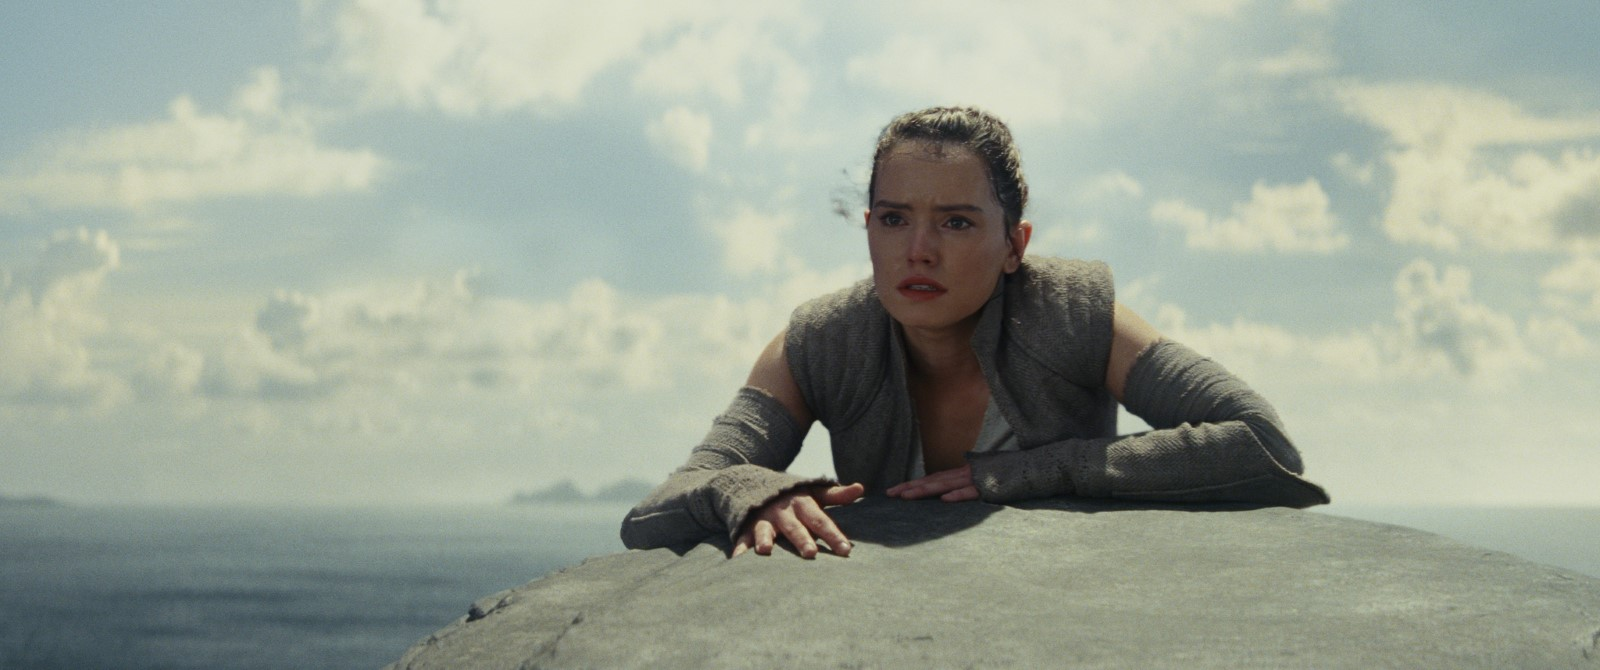 Streaming Star Wars: Los últimos Jedi